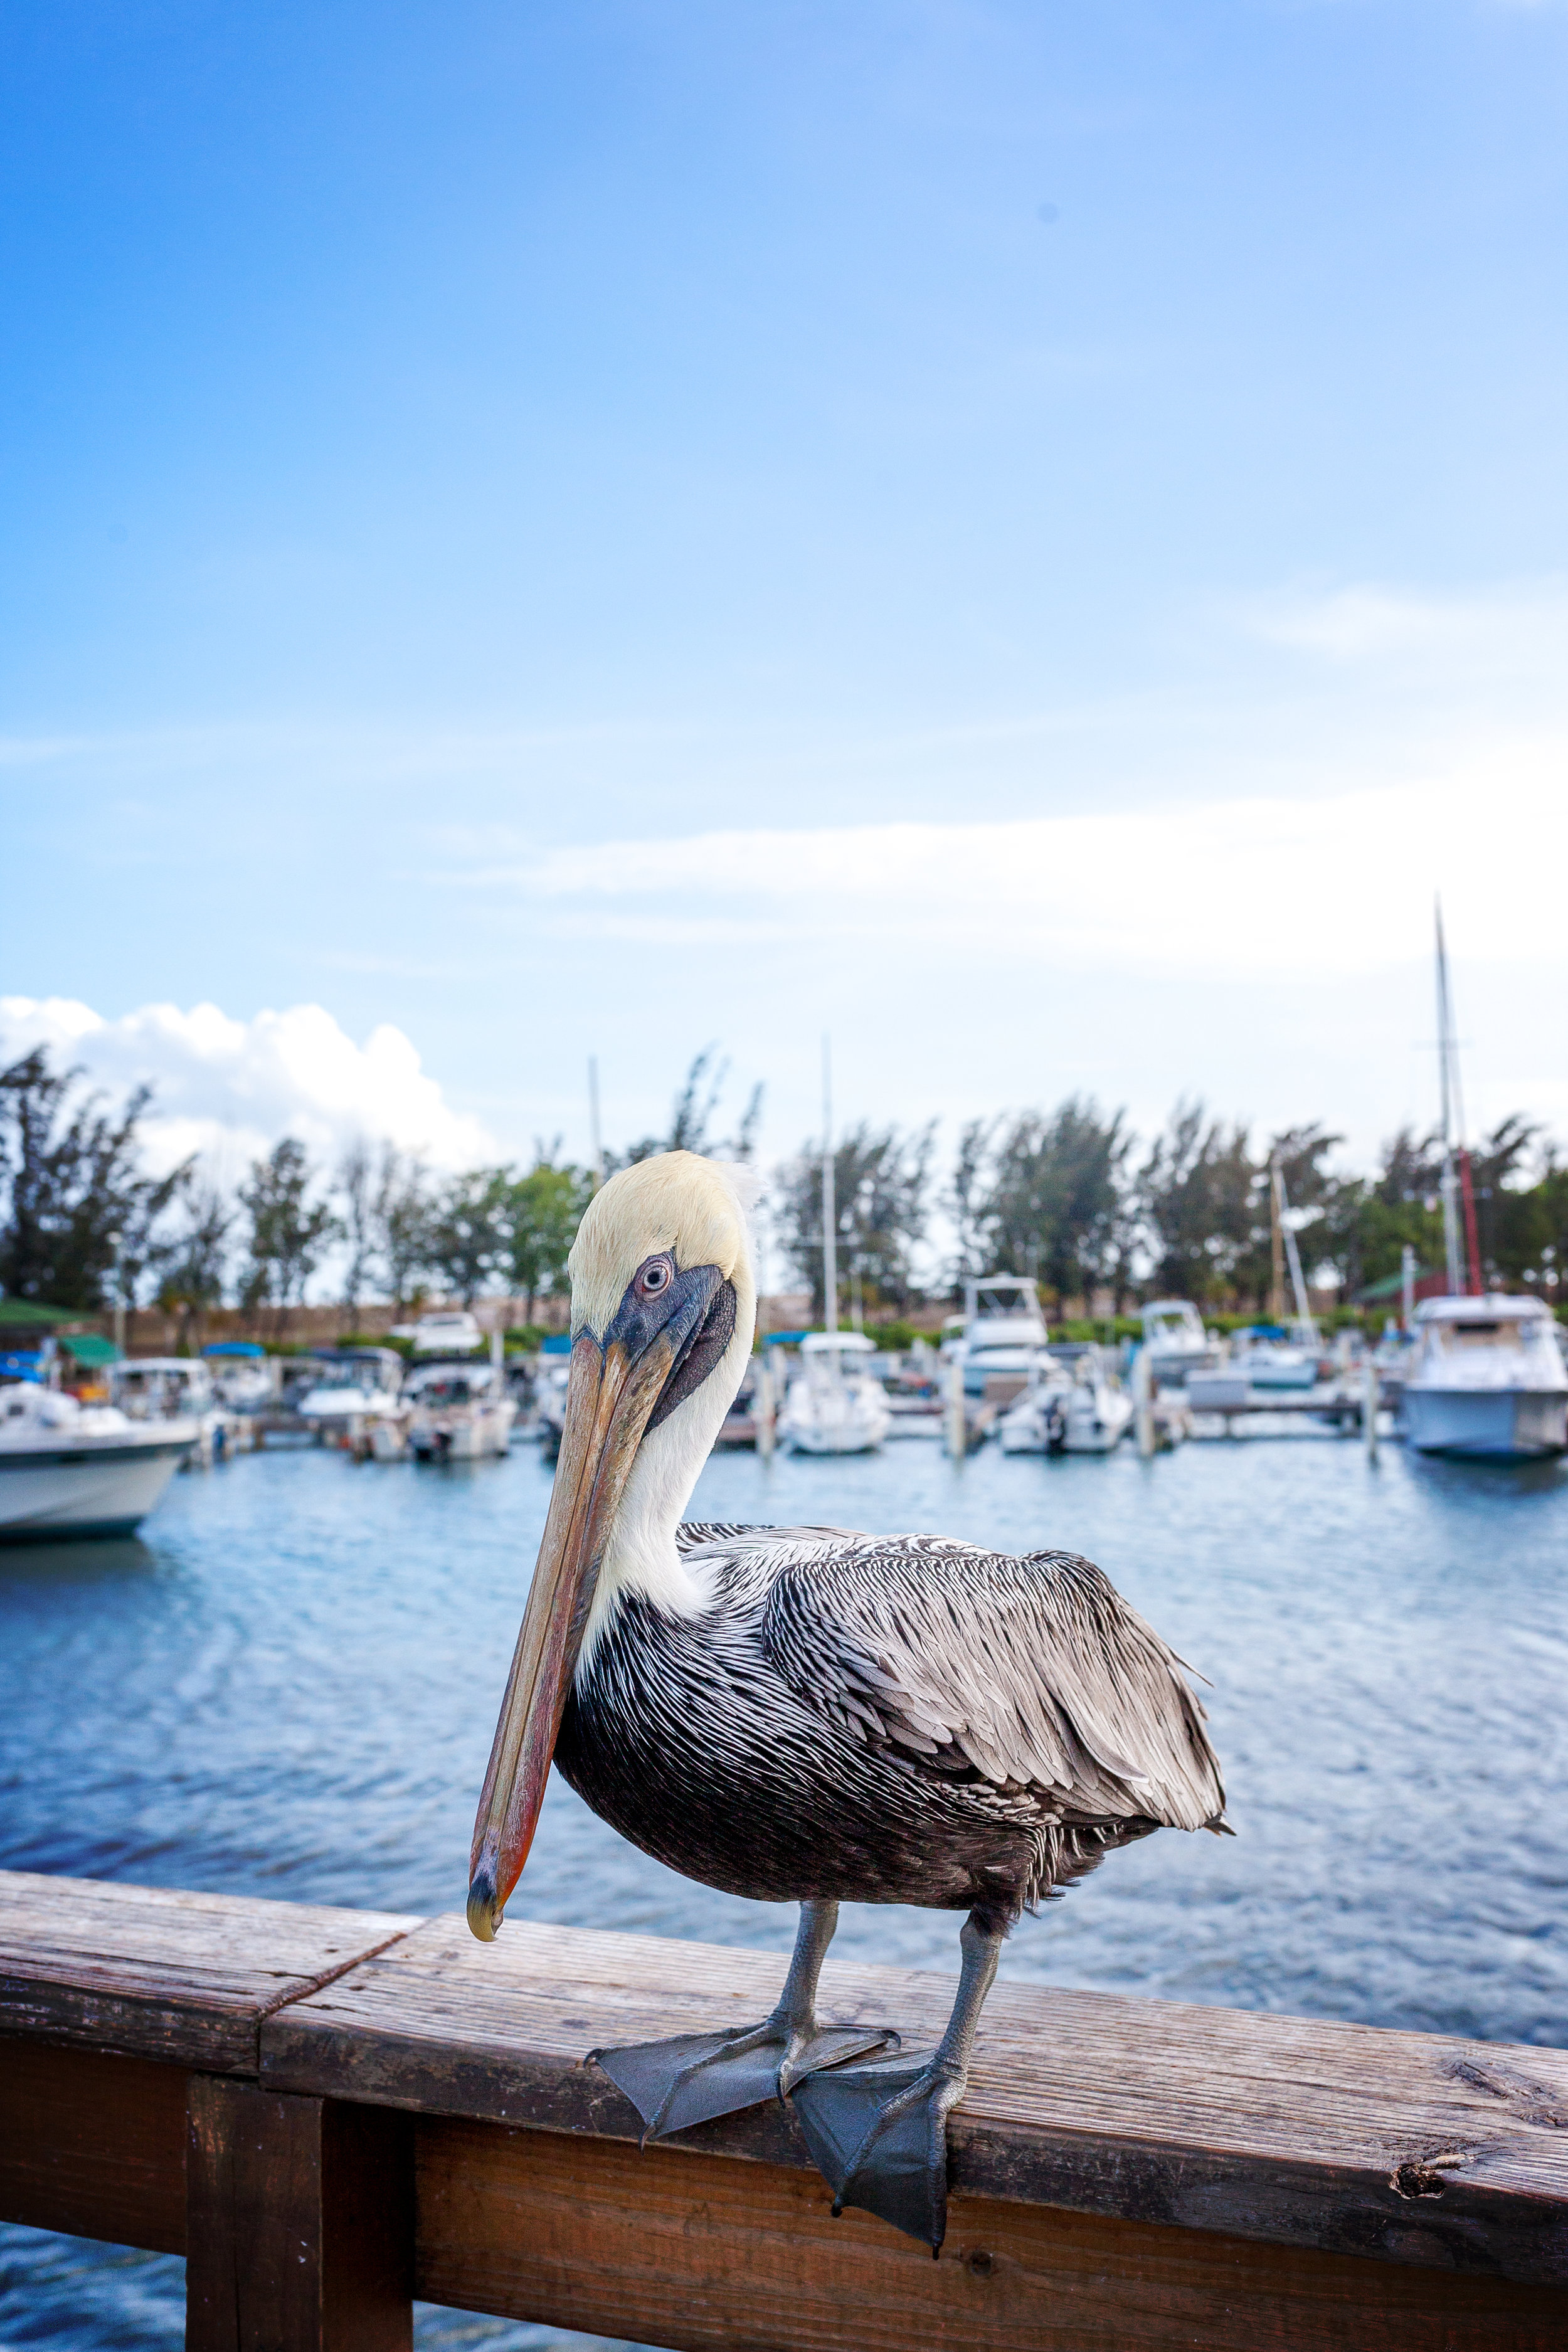 A pelican at the harbor